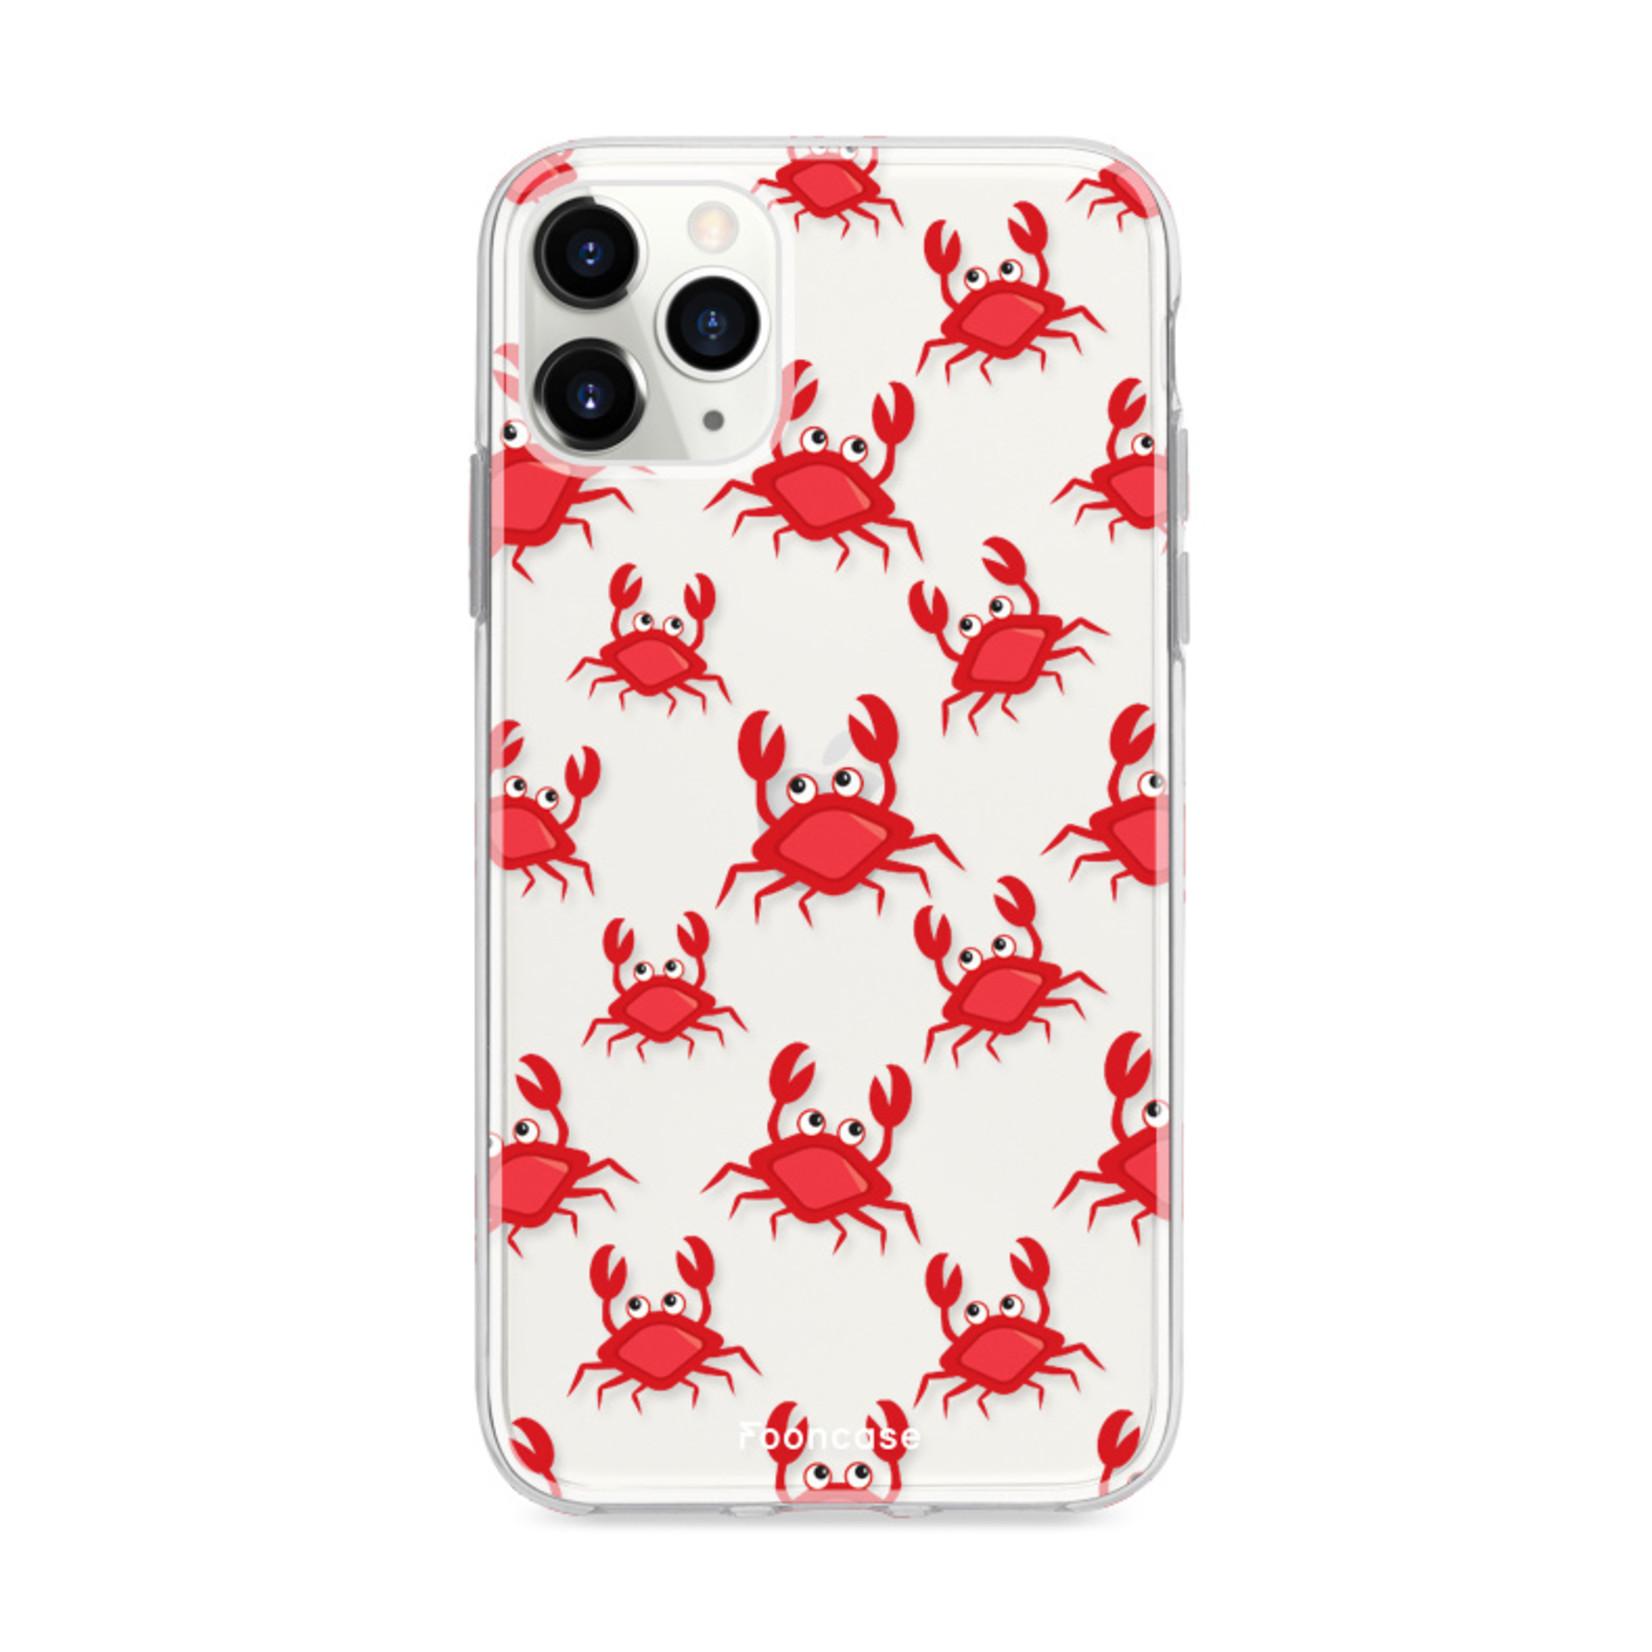 FOONCASE iPhone 12 Pro Max hoesje TPU Soft Case - Back Cover - Crabs / Krabbetjes / Krabben